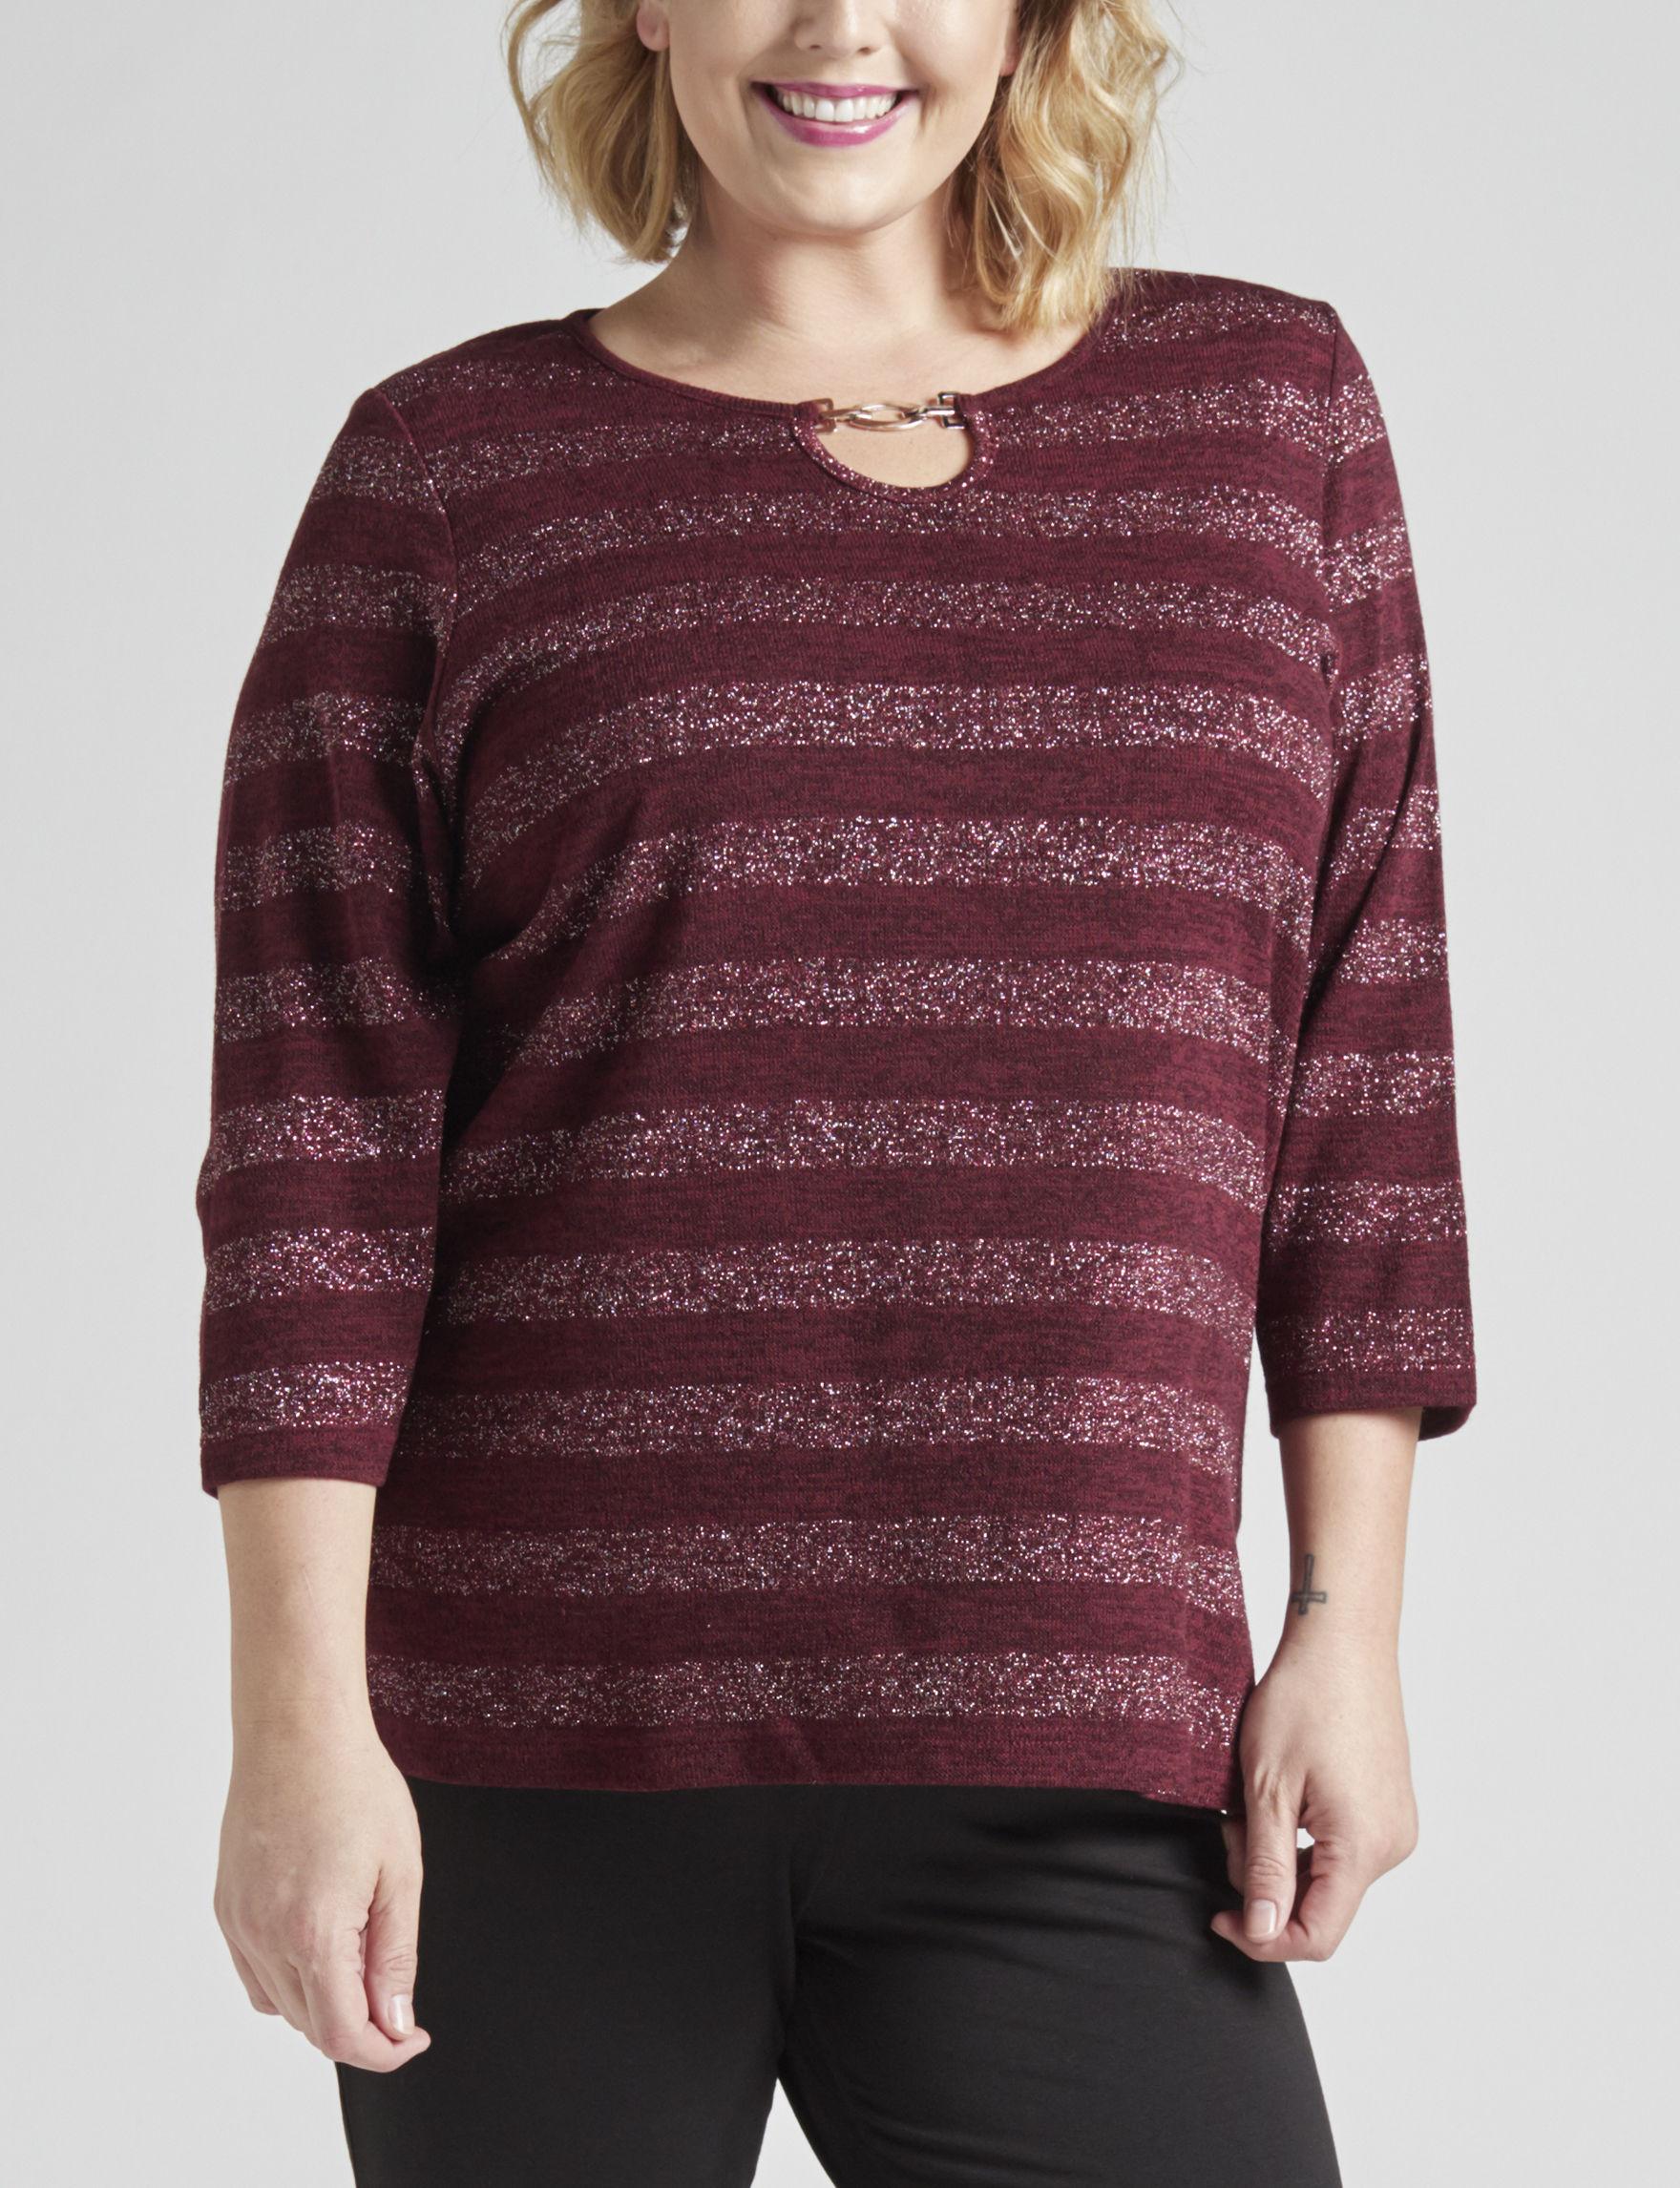 Cathy Daniels Burgundy Shirts & Blouses